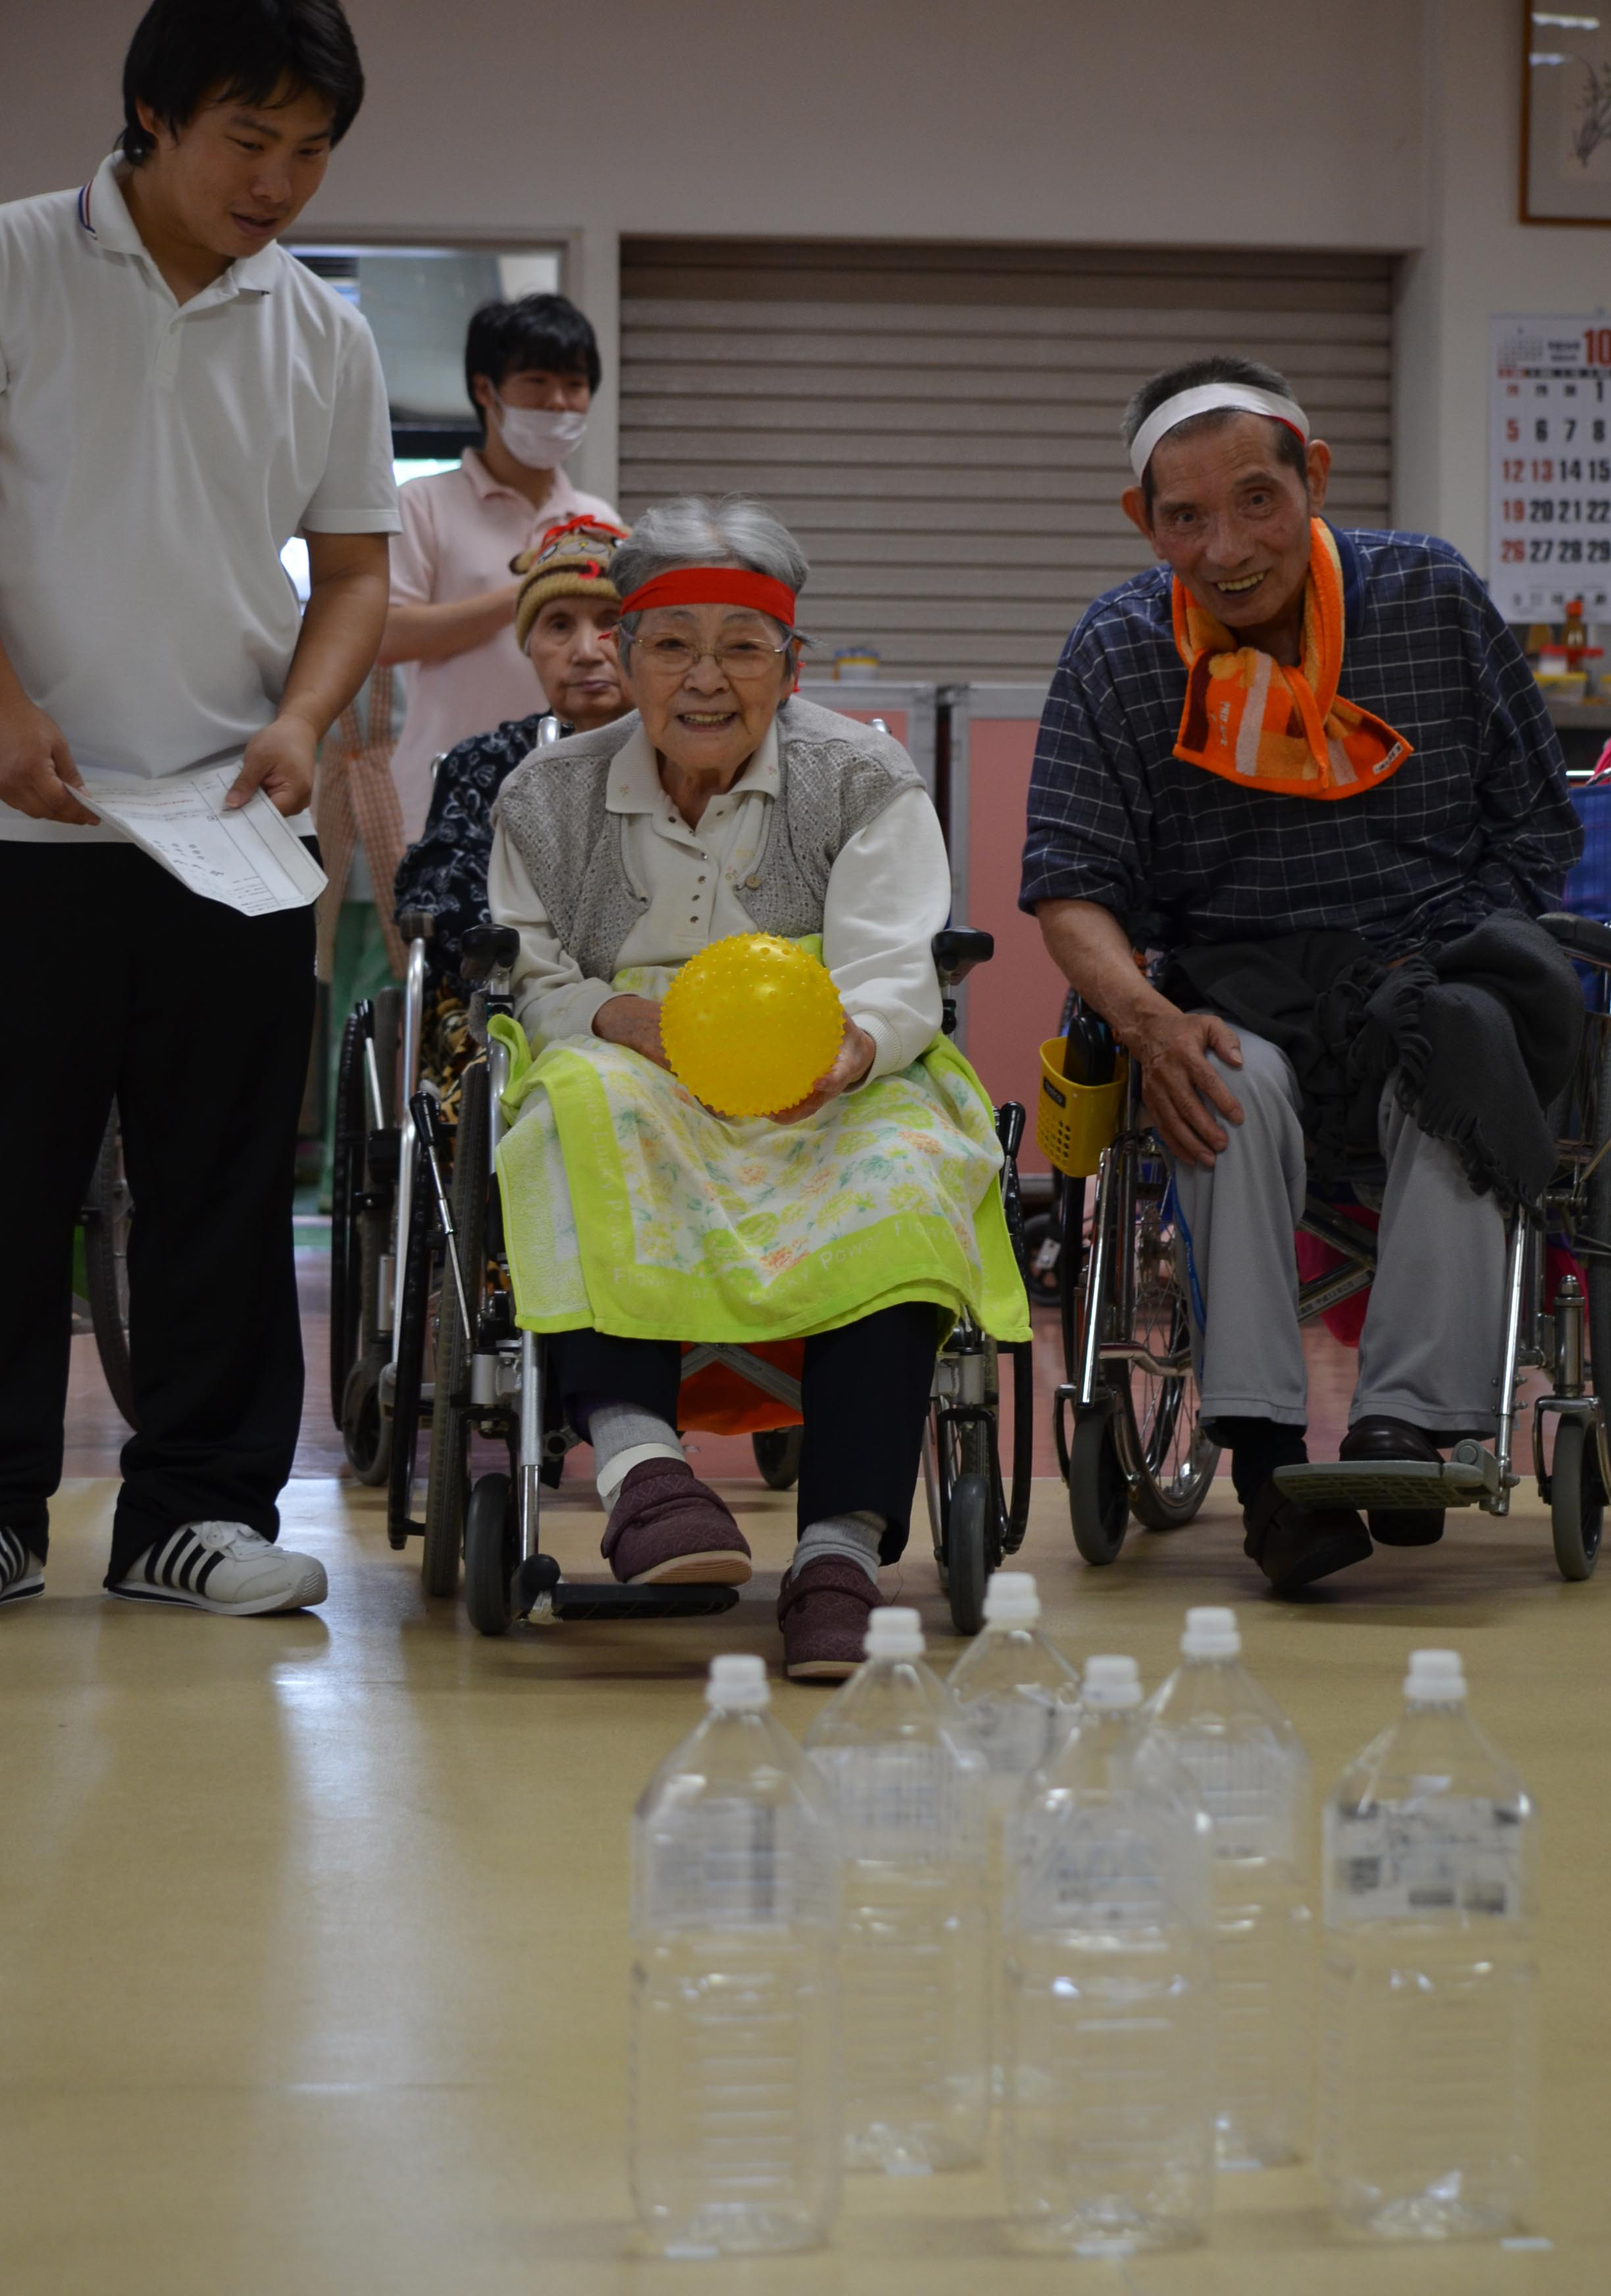 特別養護老人ホーム【愛光苑】ゲーム大会写真